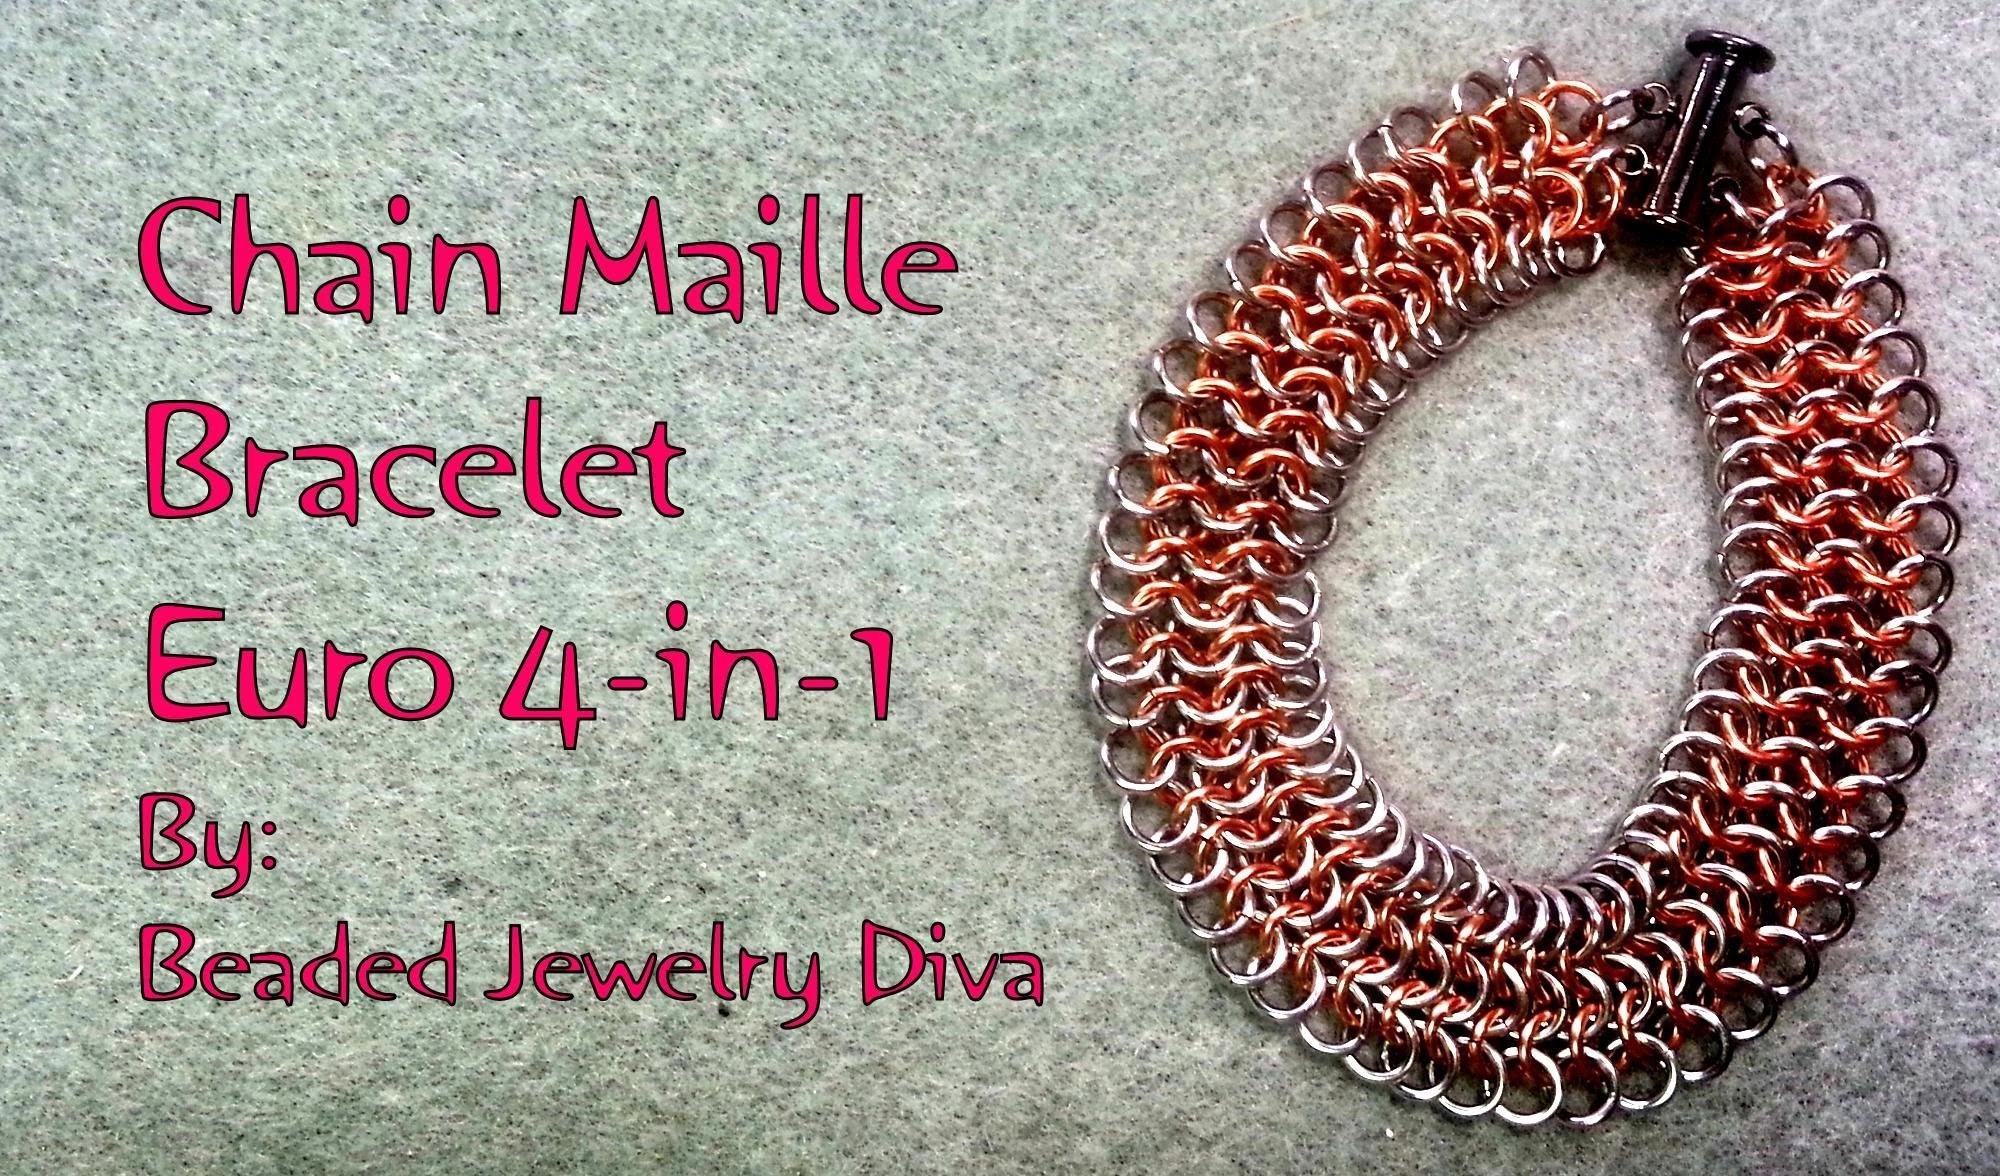 Chain Maille Bracelet Tutorial - European 4-in-1 Weave